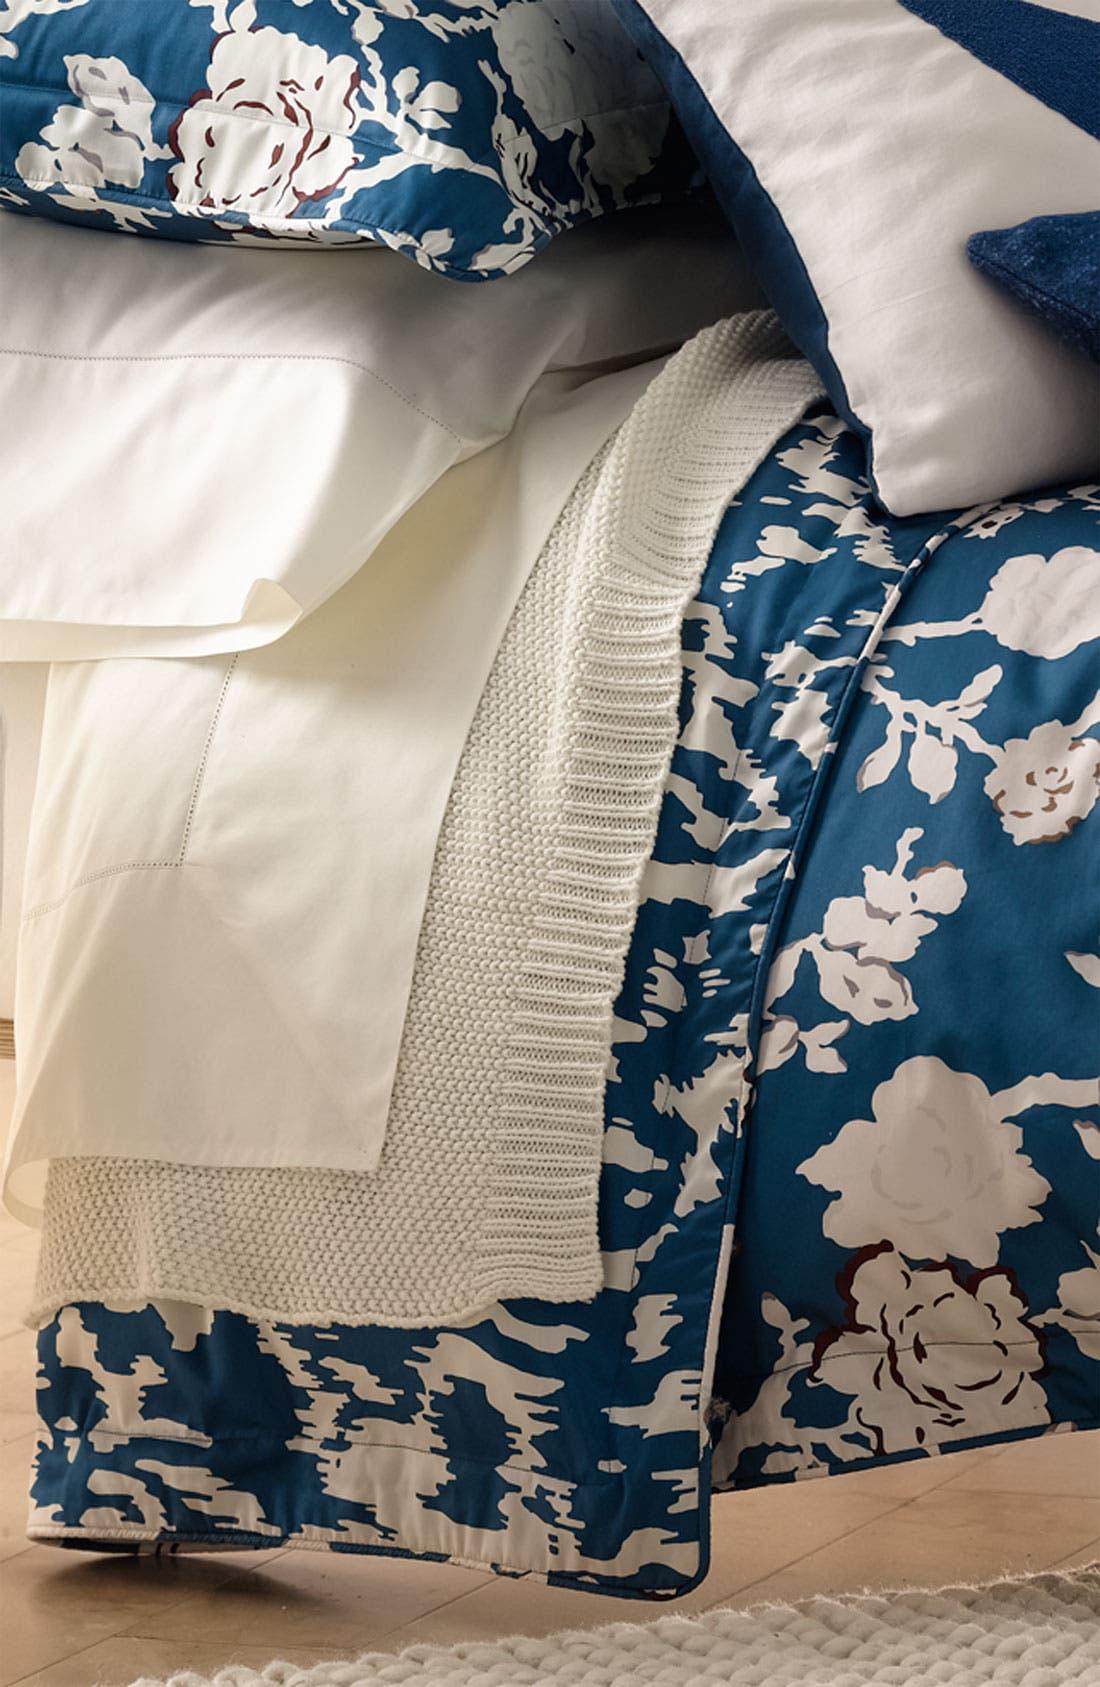 Alternate Image 1 Selected - Diane von Furstenberg 'China Vine' 300 Thread Count Duvet Cover